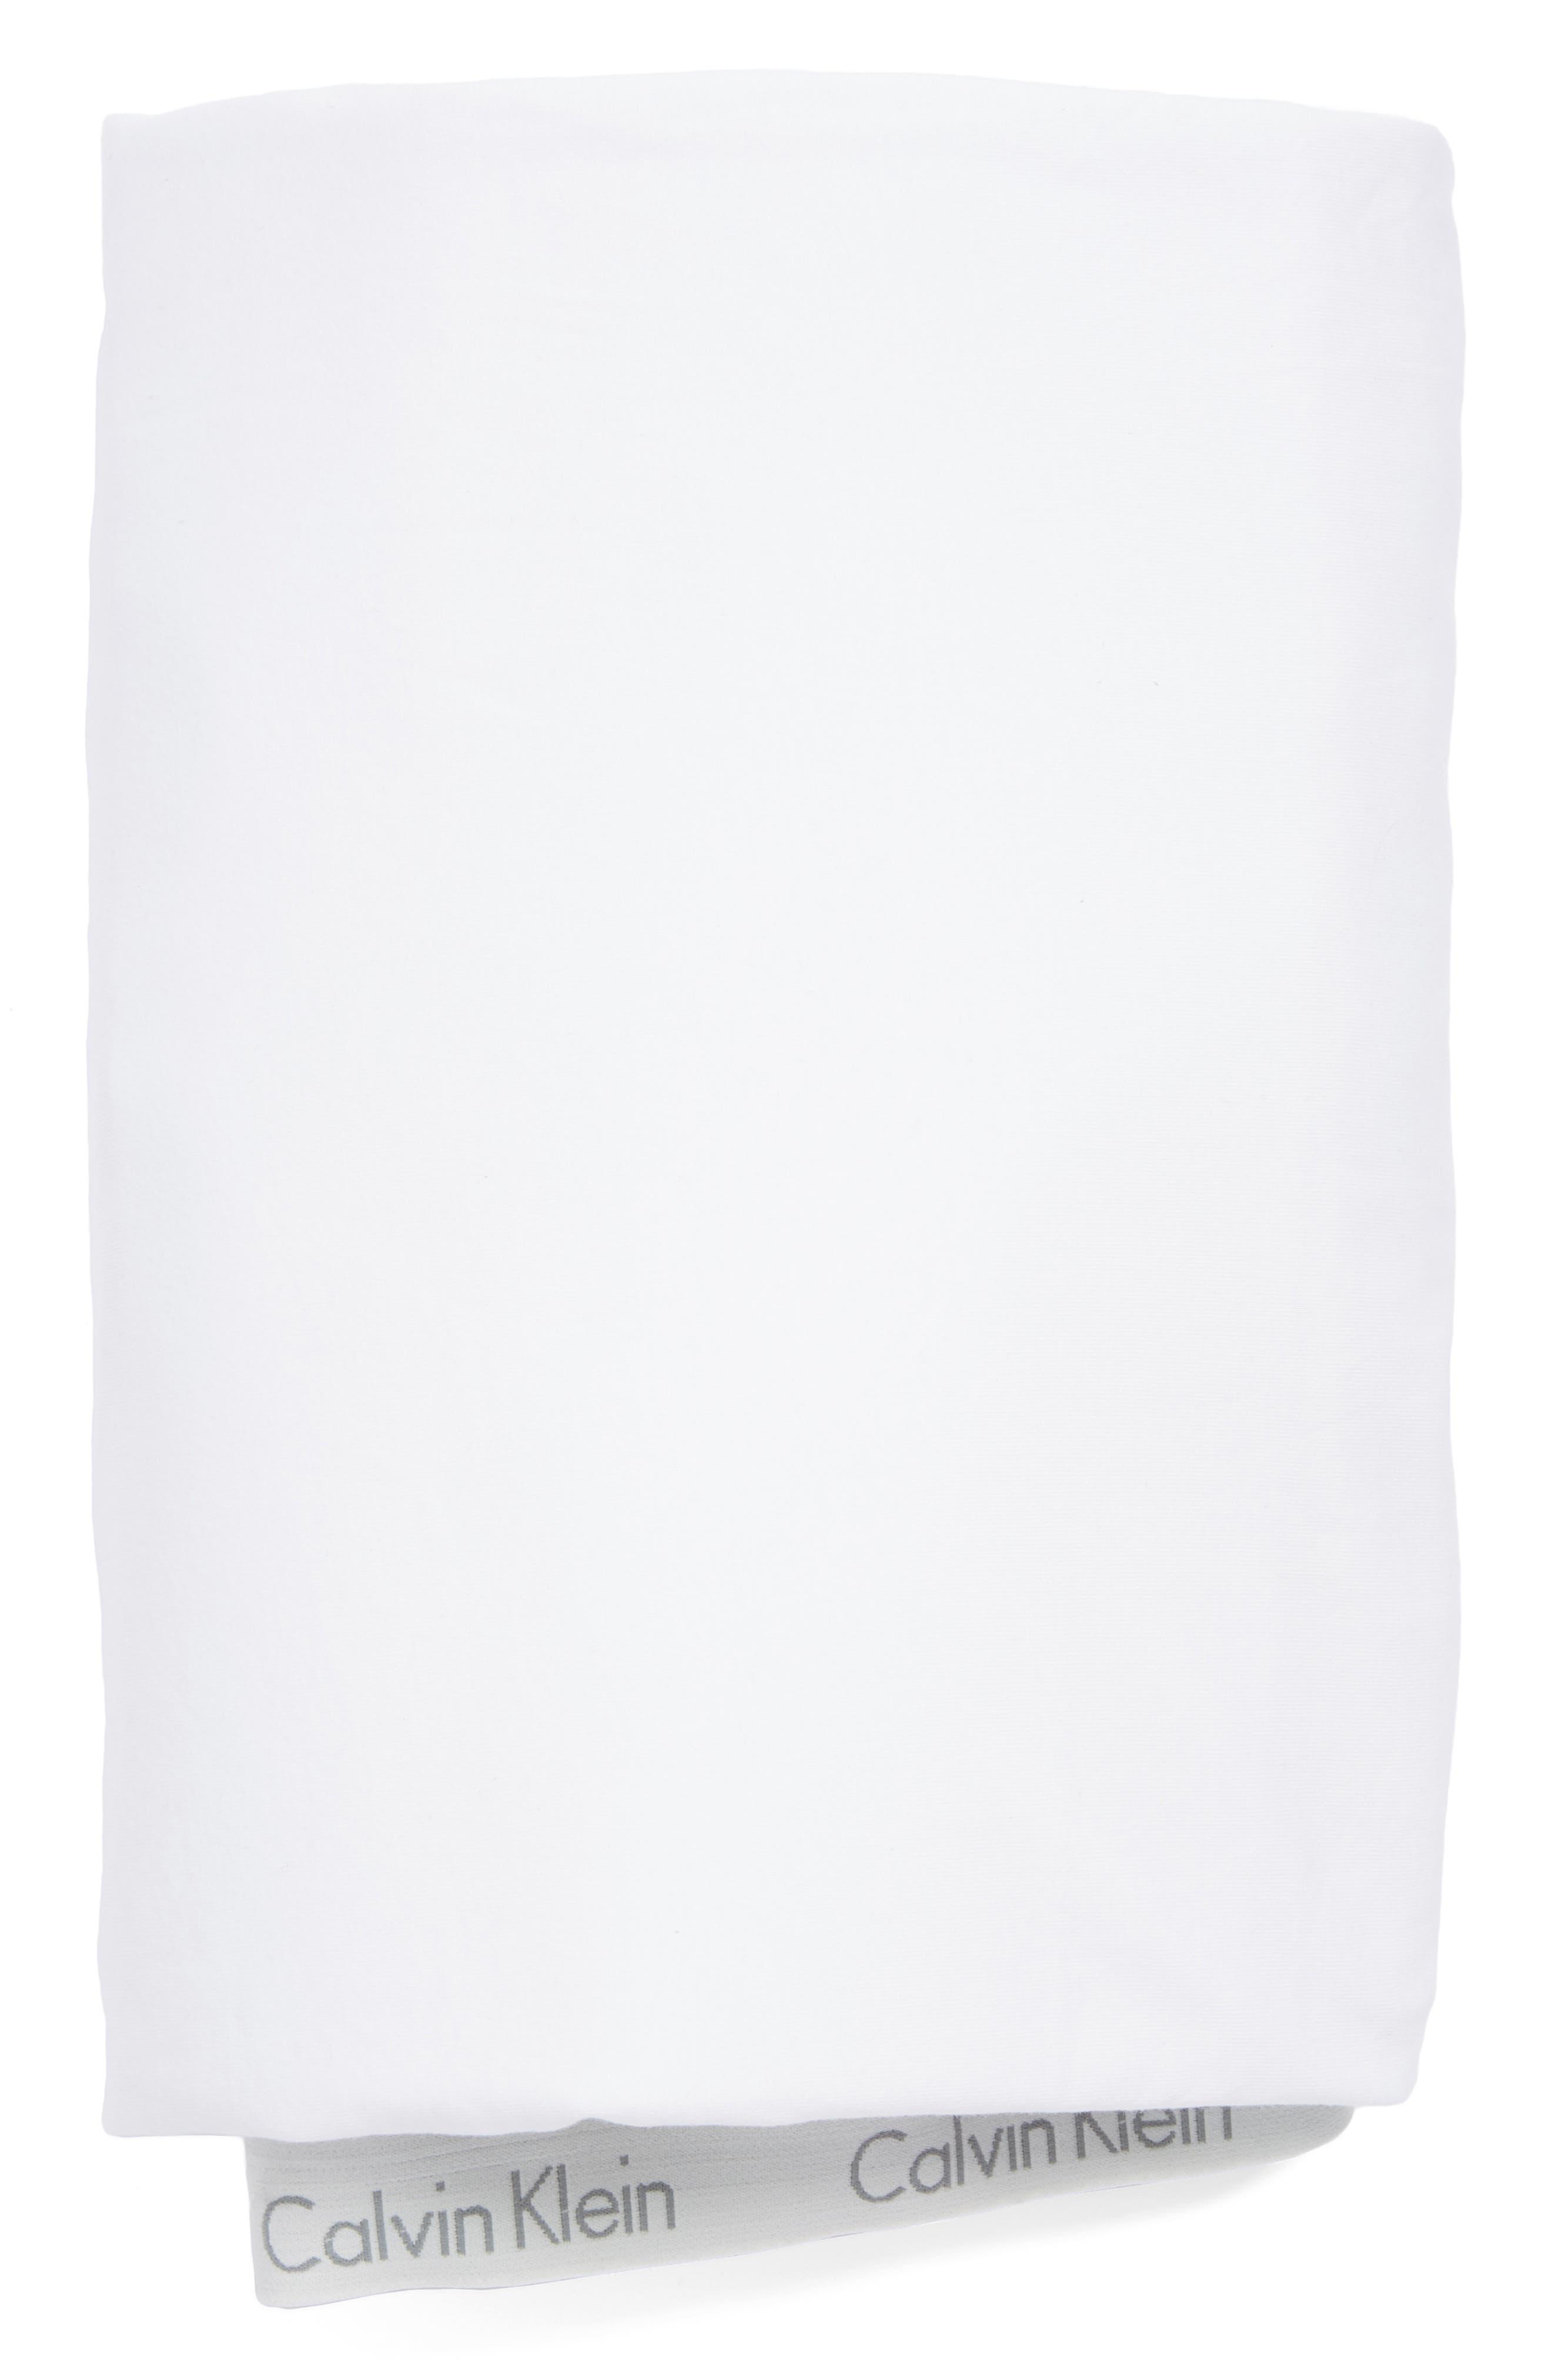 Calvin Klein Home Modern Cotton Collection Cotton & Modal Fitted Sheet